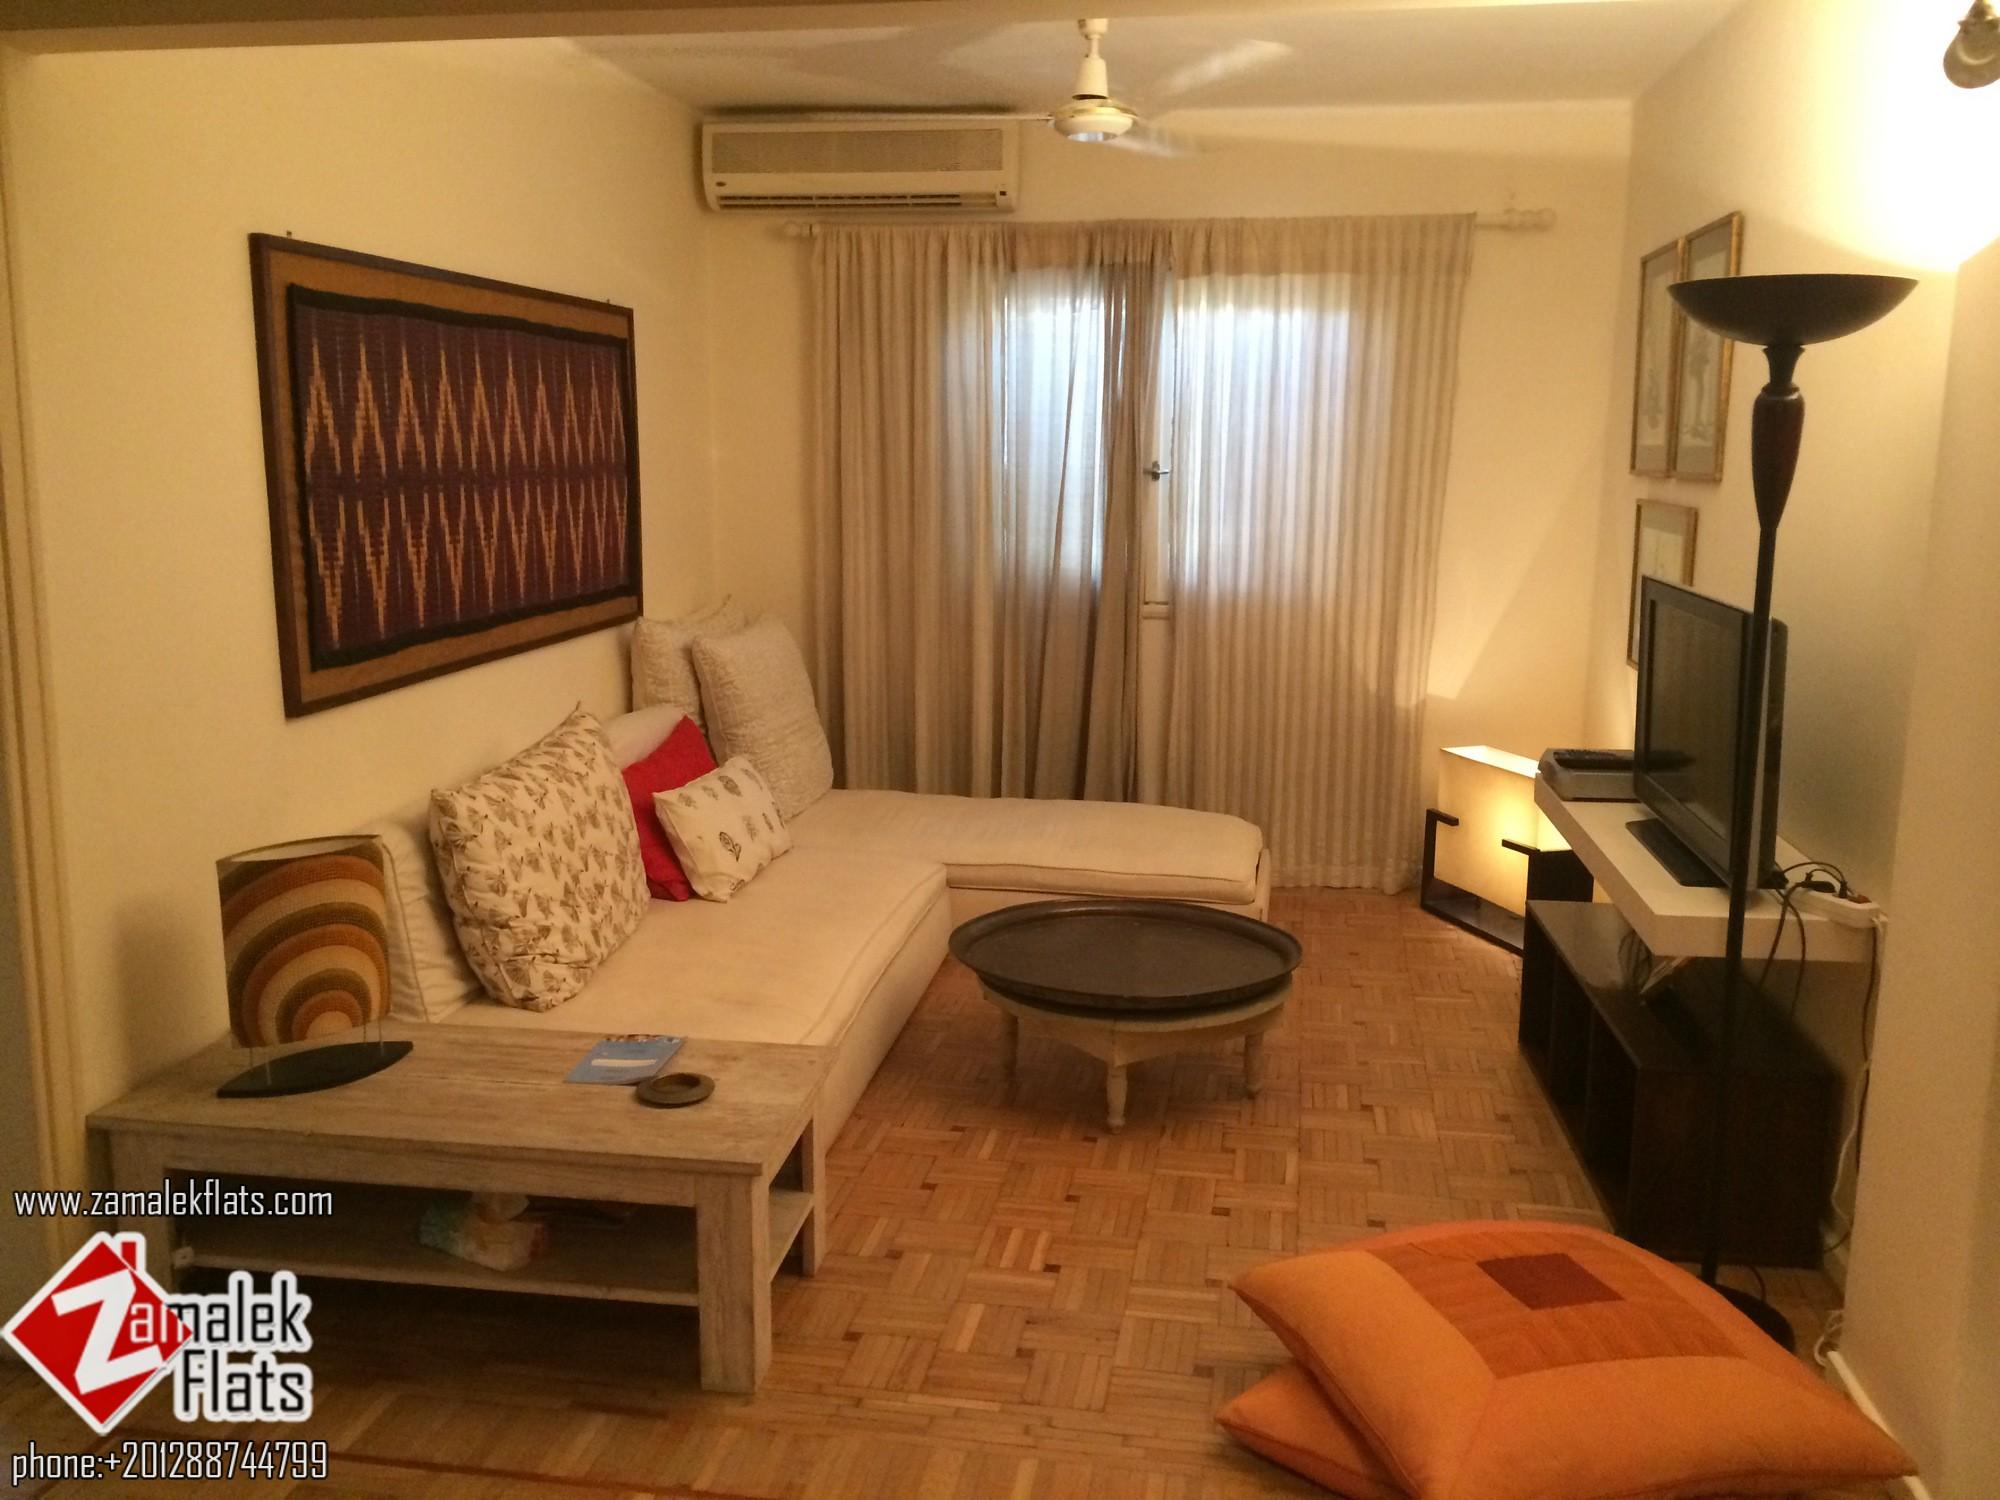 Comfortable Furnished Apt In Zamalek